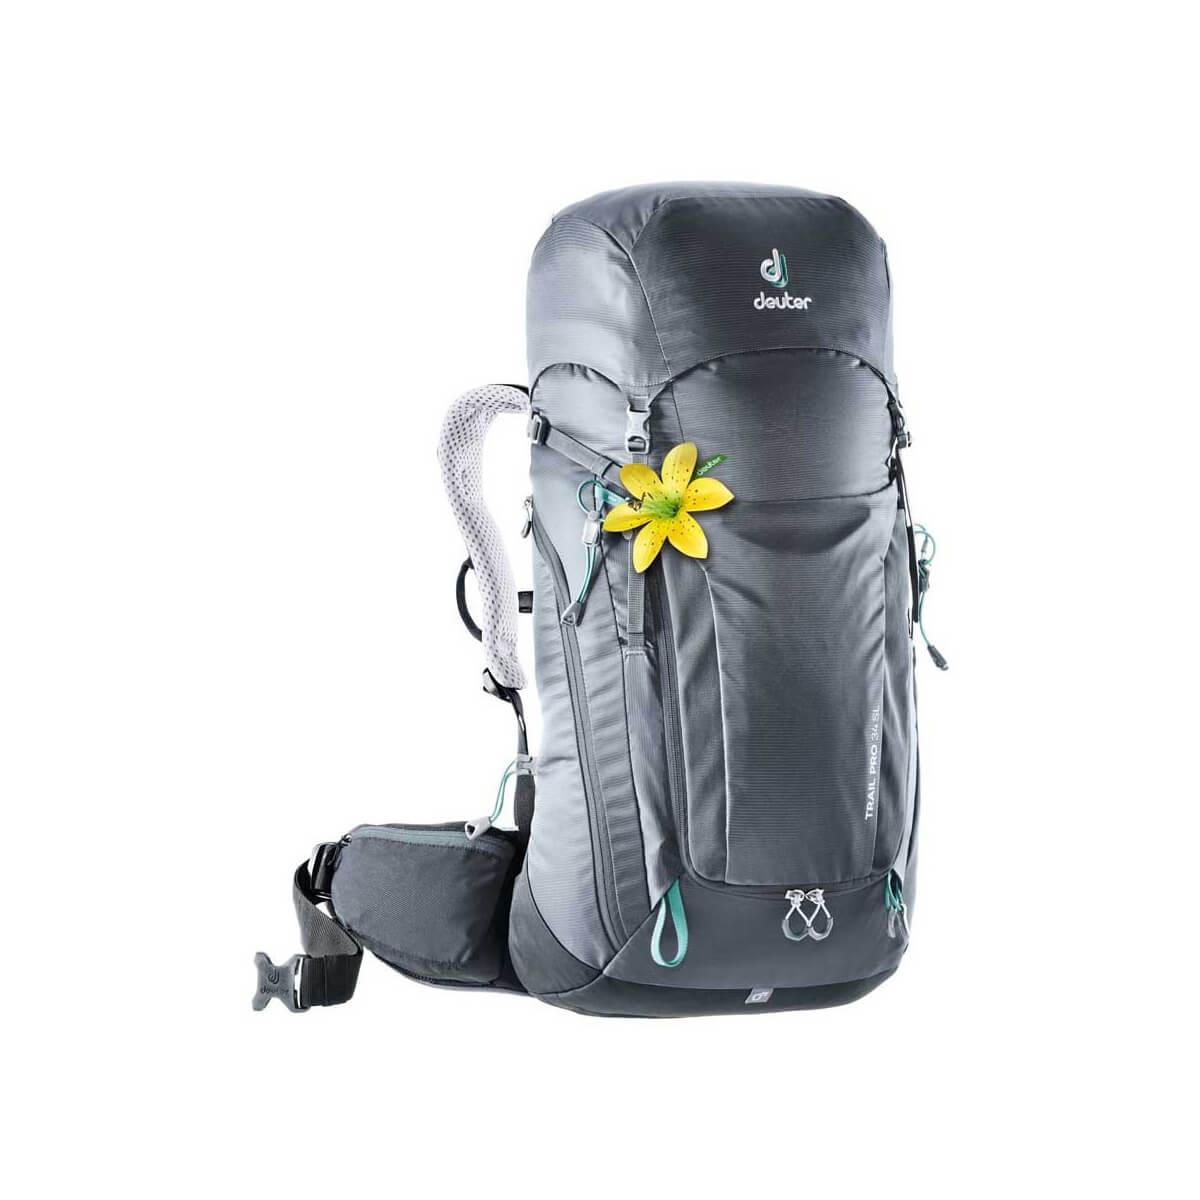 Trail Pro 34 SL graphite-black